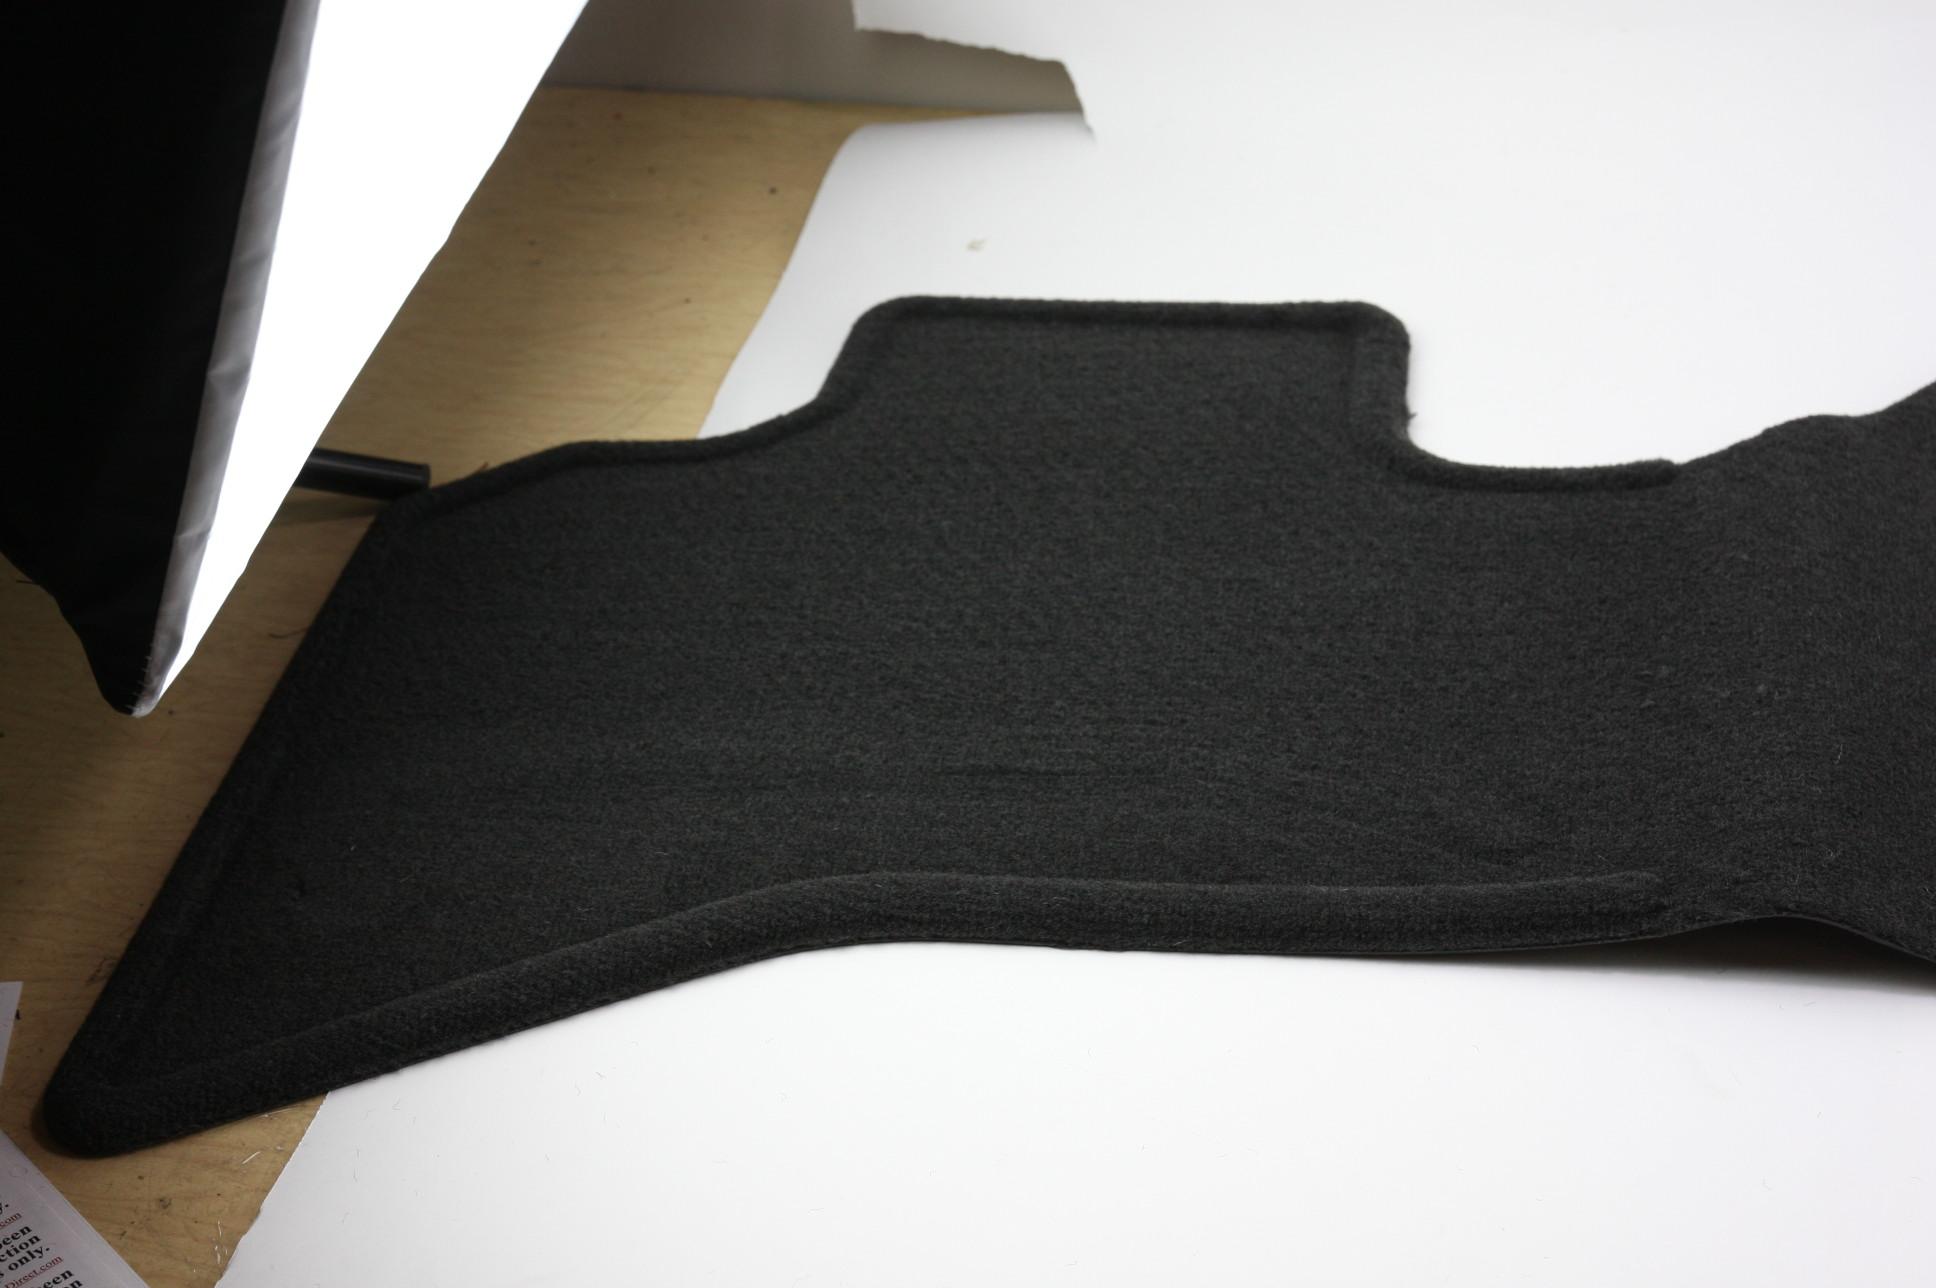 *** New OEM 82207050 02-05 Dodge Ram w/ Logo Premium Rear Carpet Floor Mat - image 3